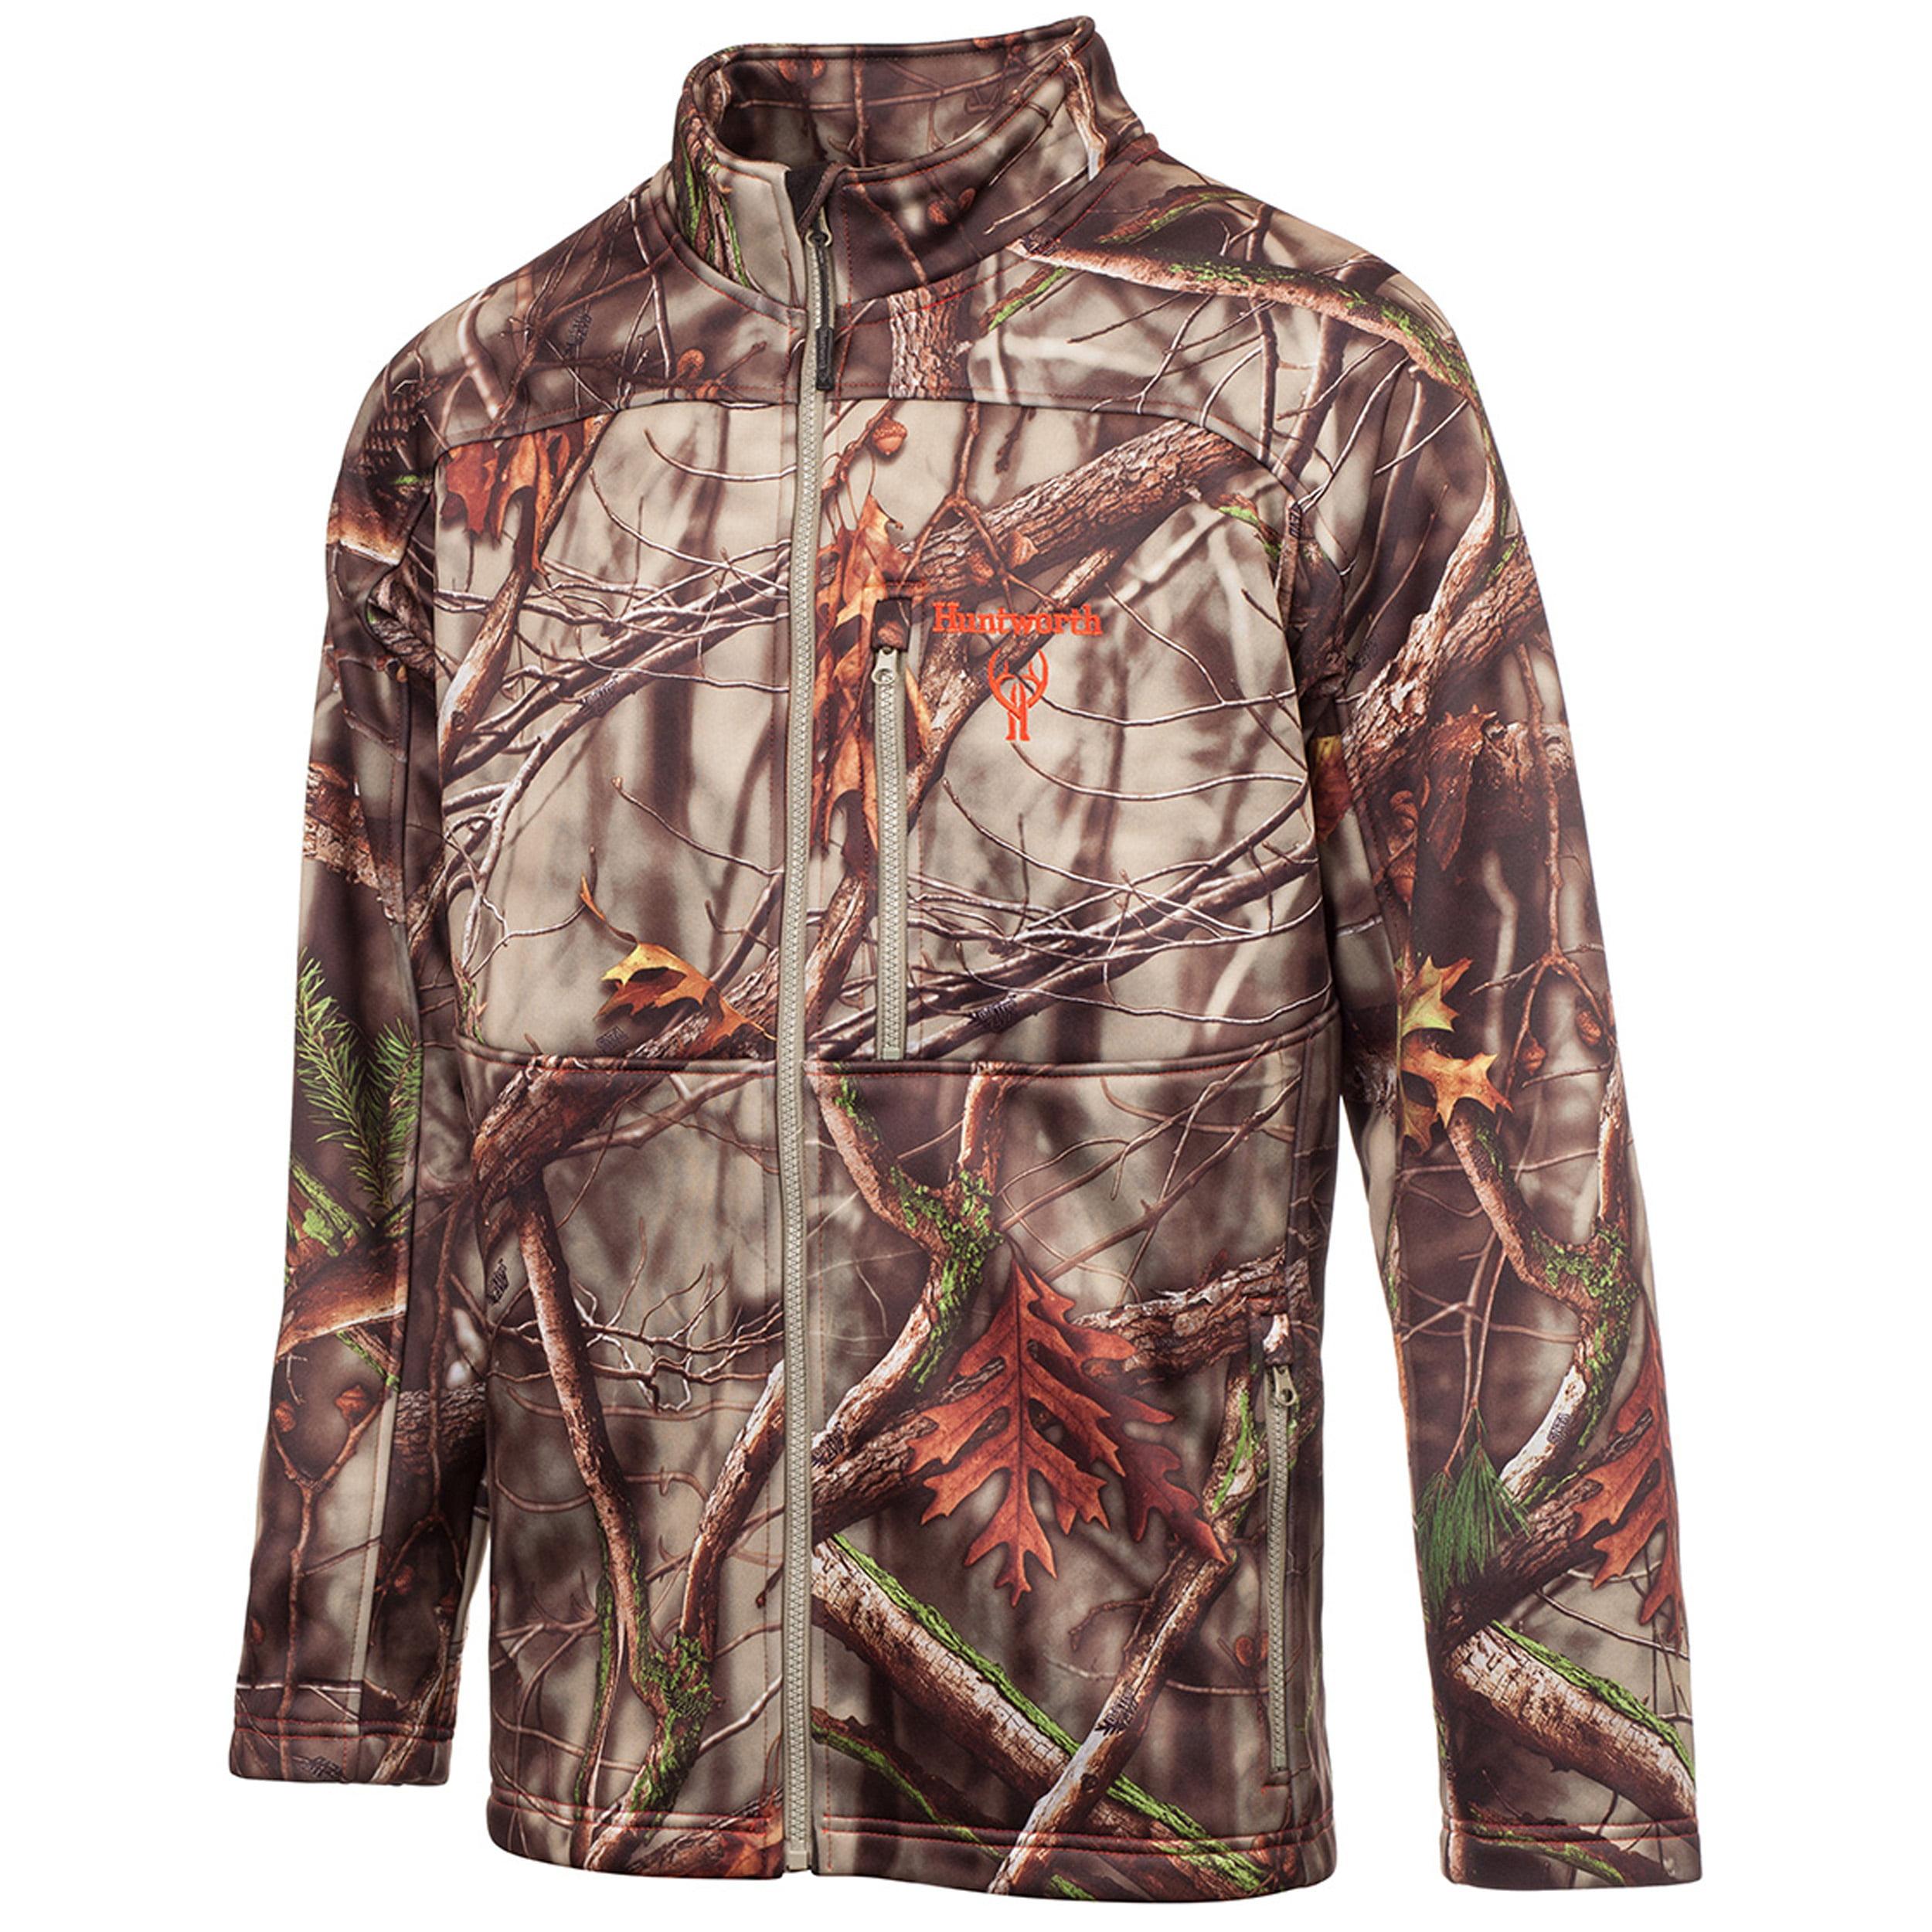 Men's Soft Shell Jacket RaFlekt print interior by NTA Enterprise Inc